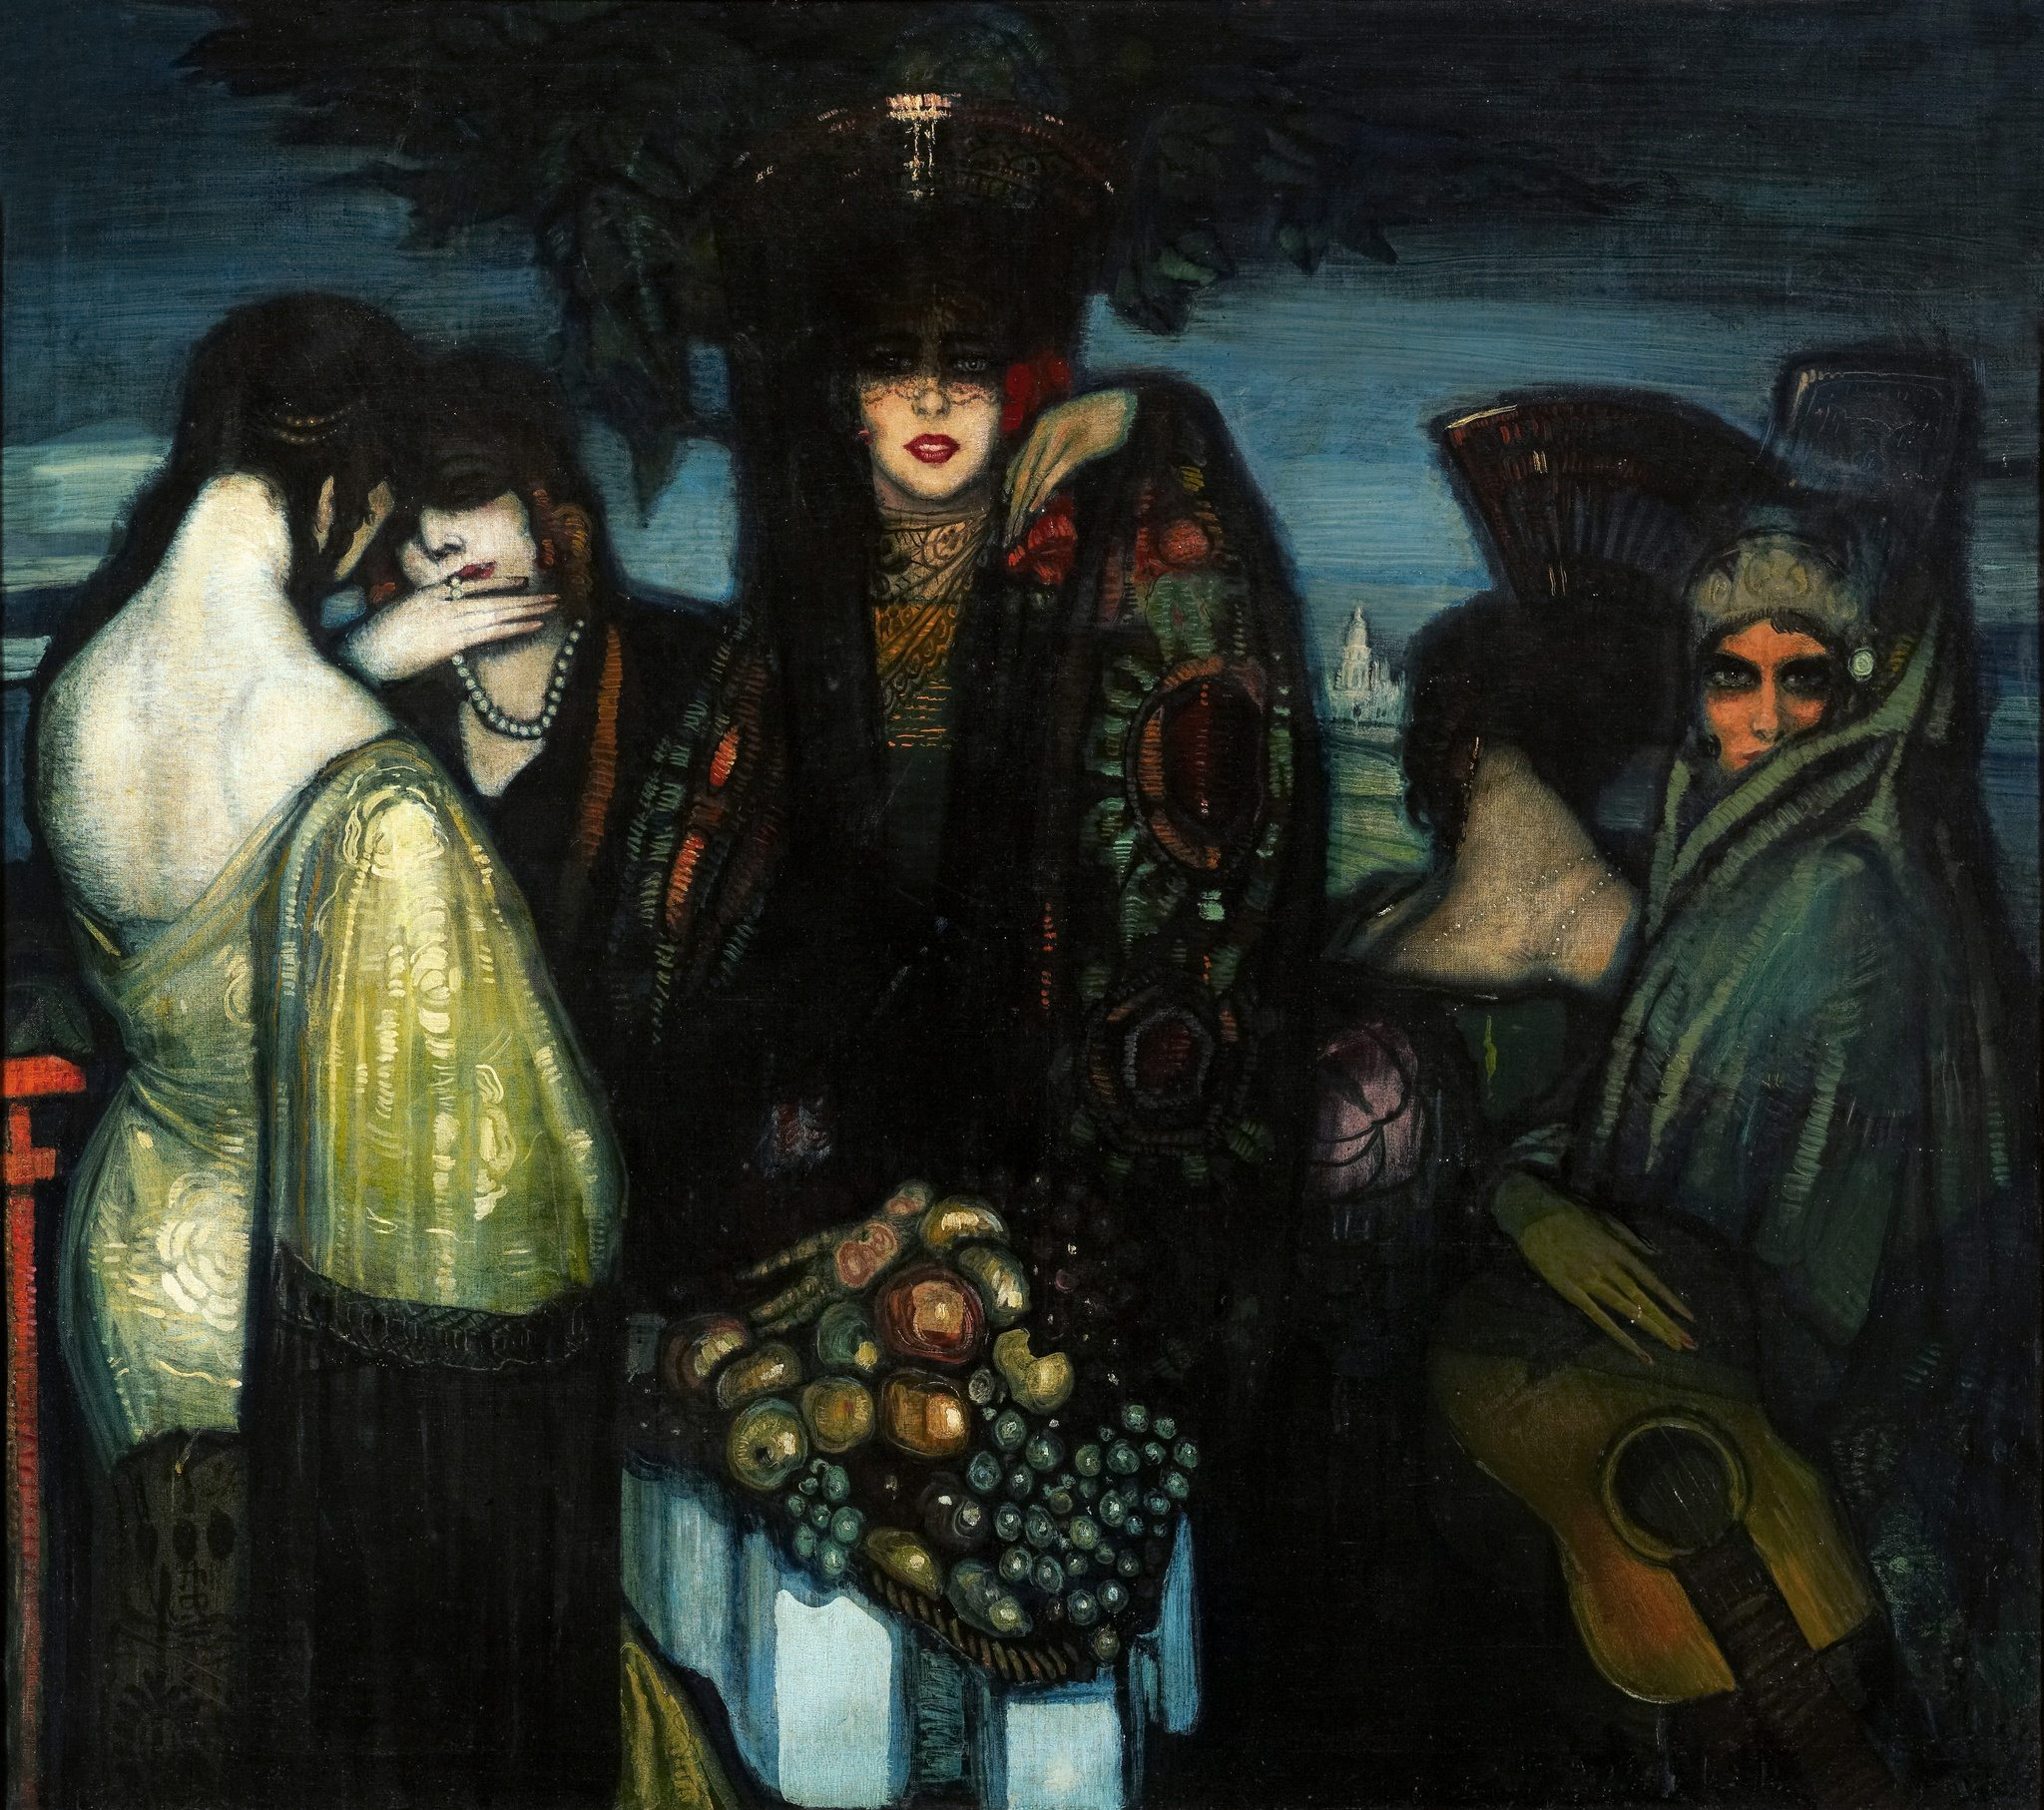 Las Ibericas (The Iberian Women)